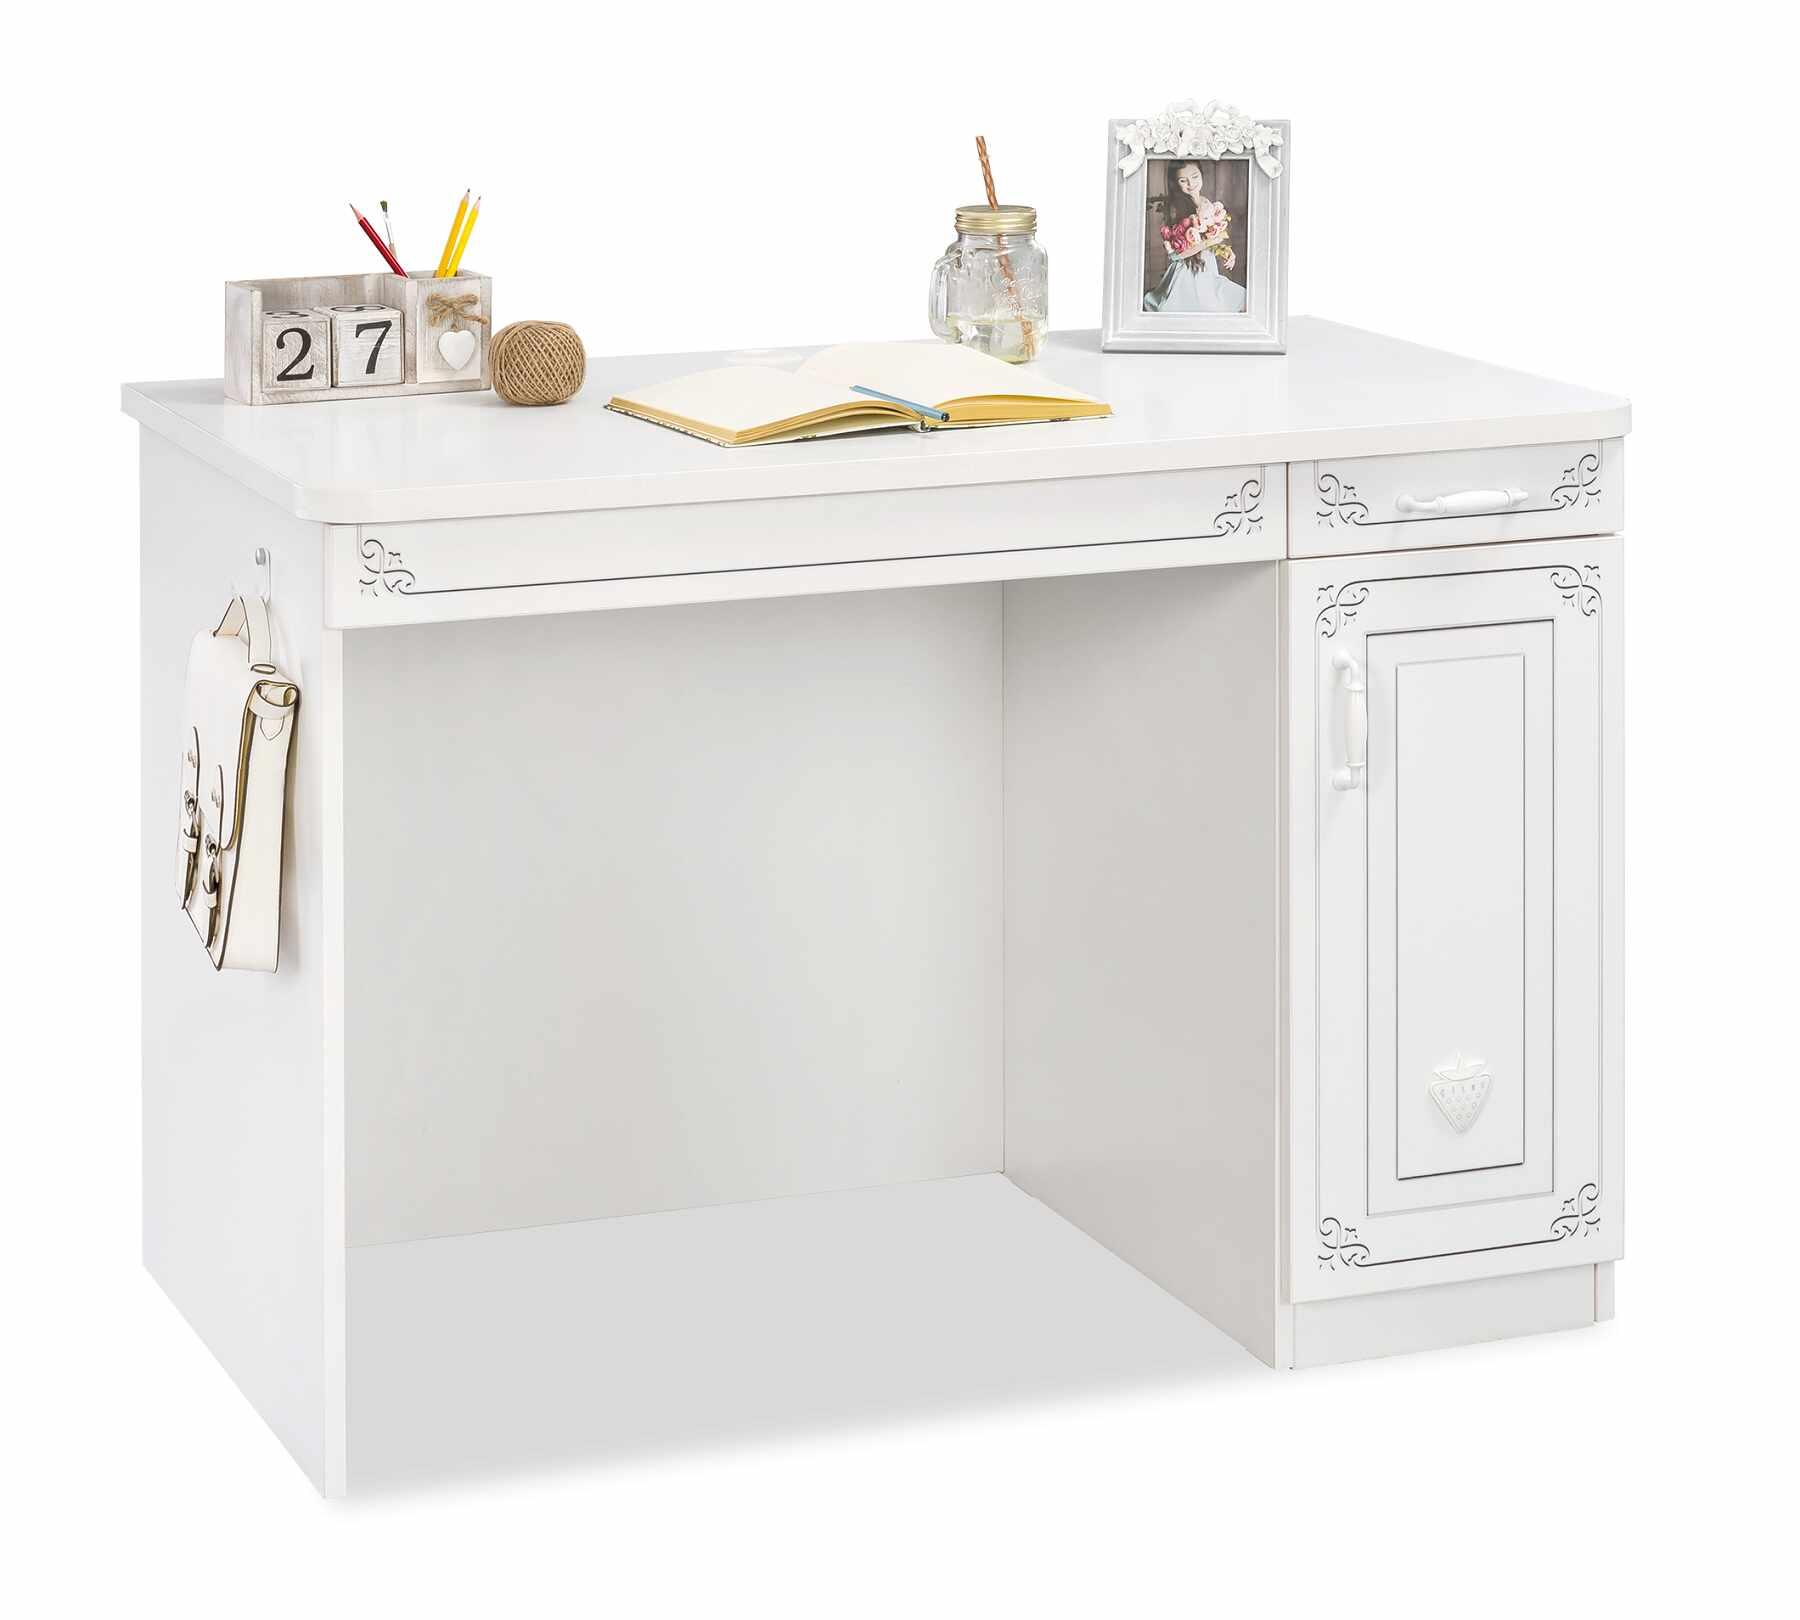 Masa de birou din pal cu 1 usa si 2 sertare, pentru tineret Selena Alb, l113xA64xH75 cm la pret 574 lei